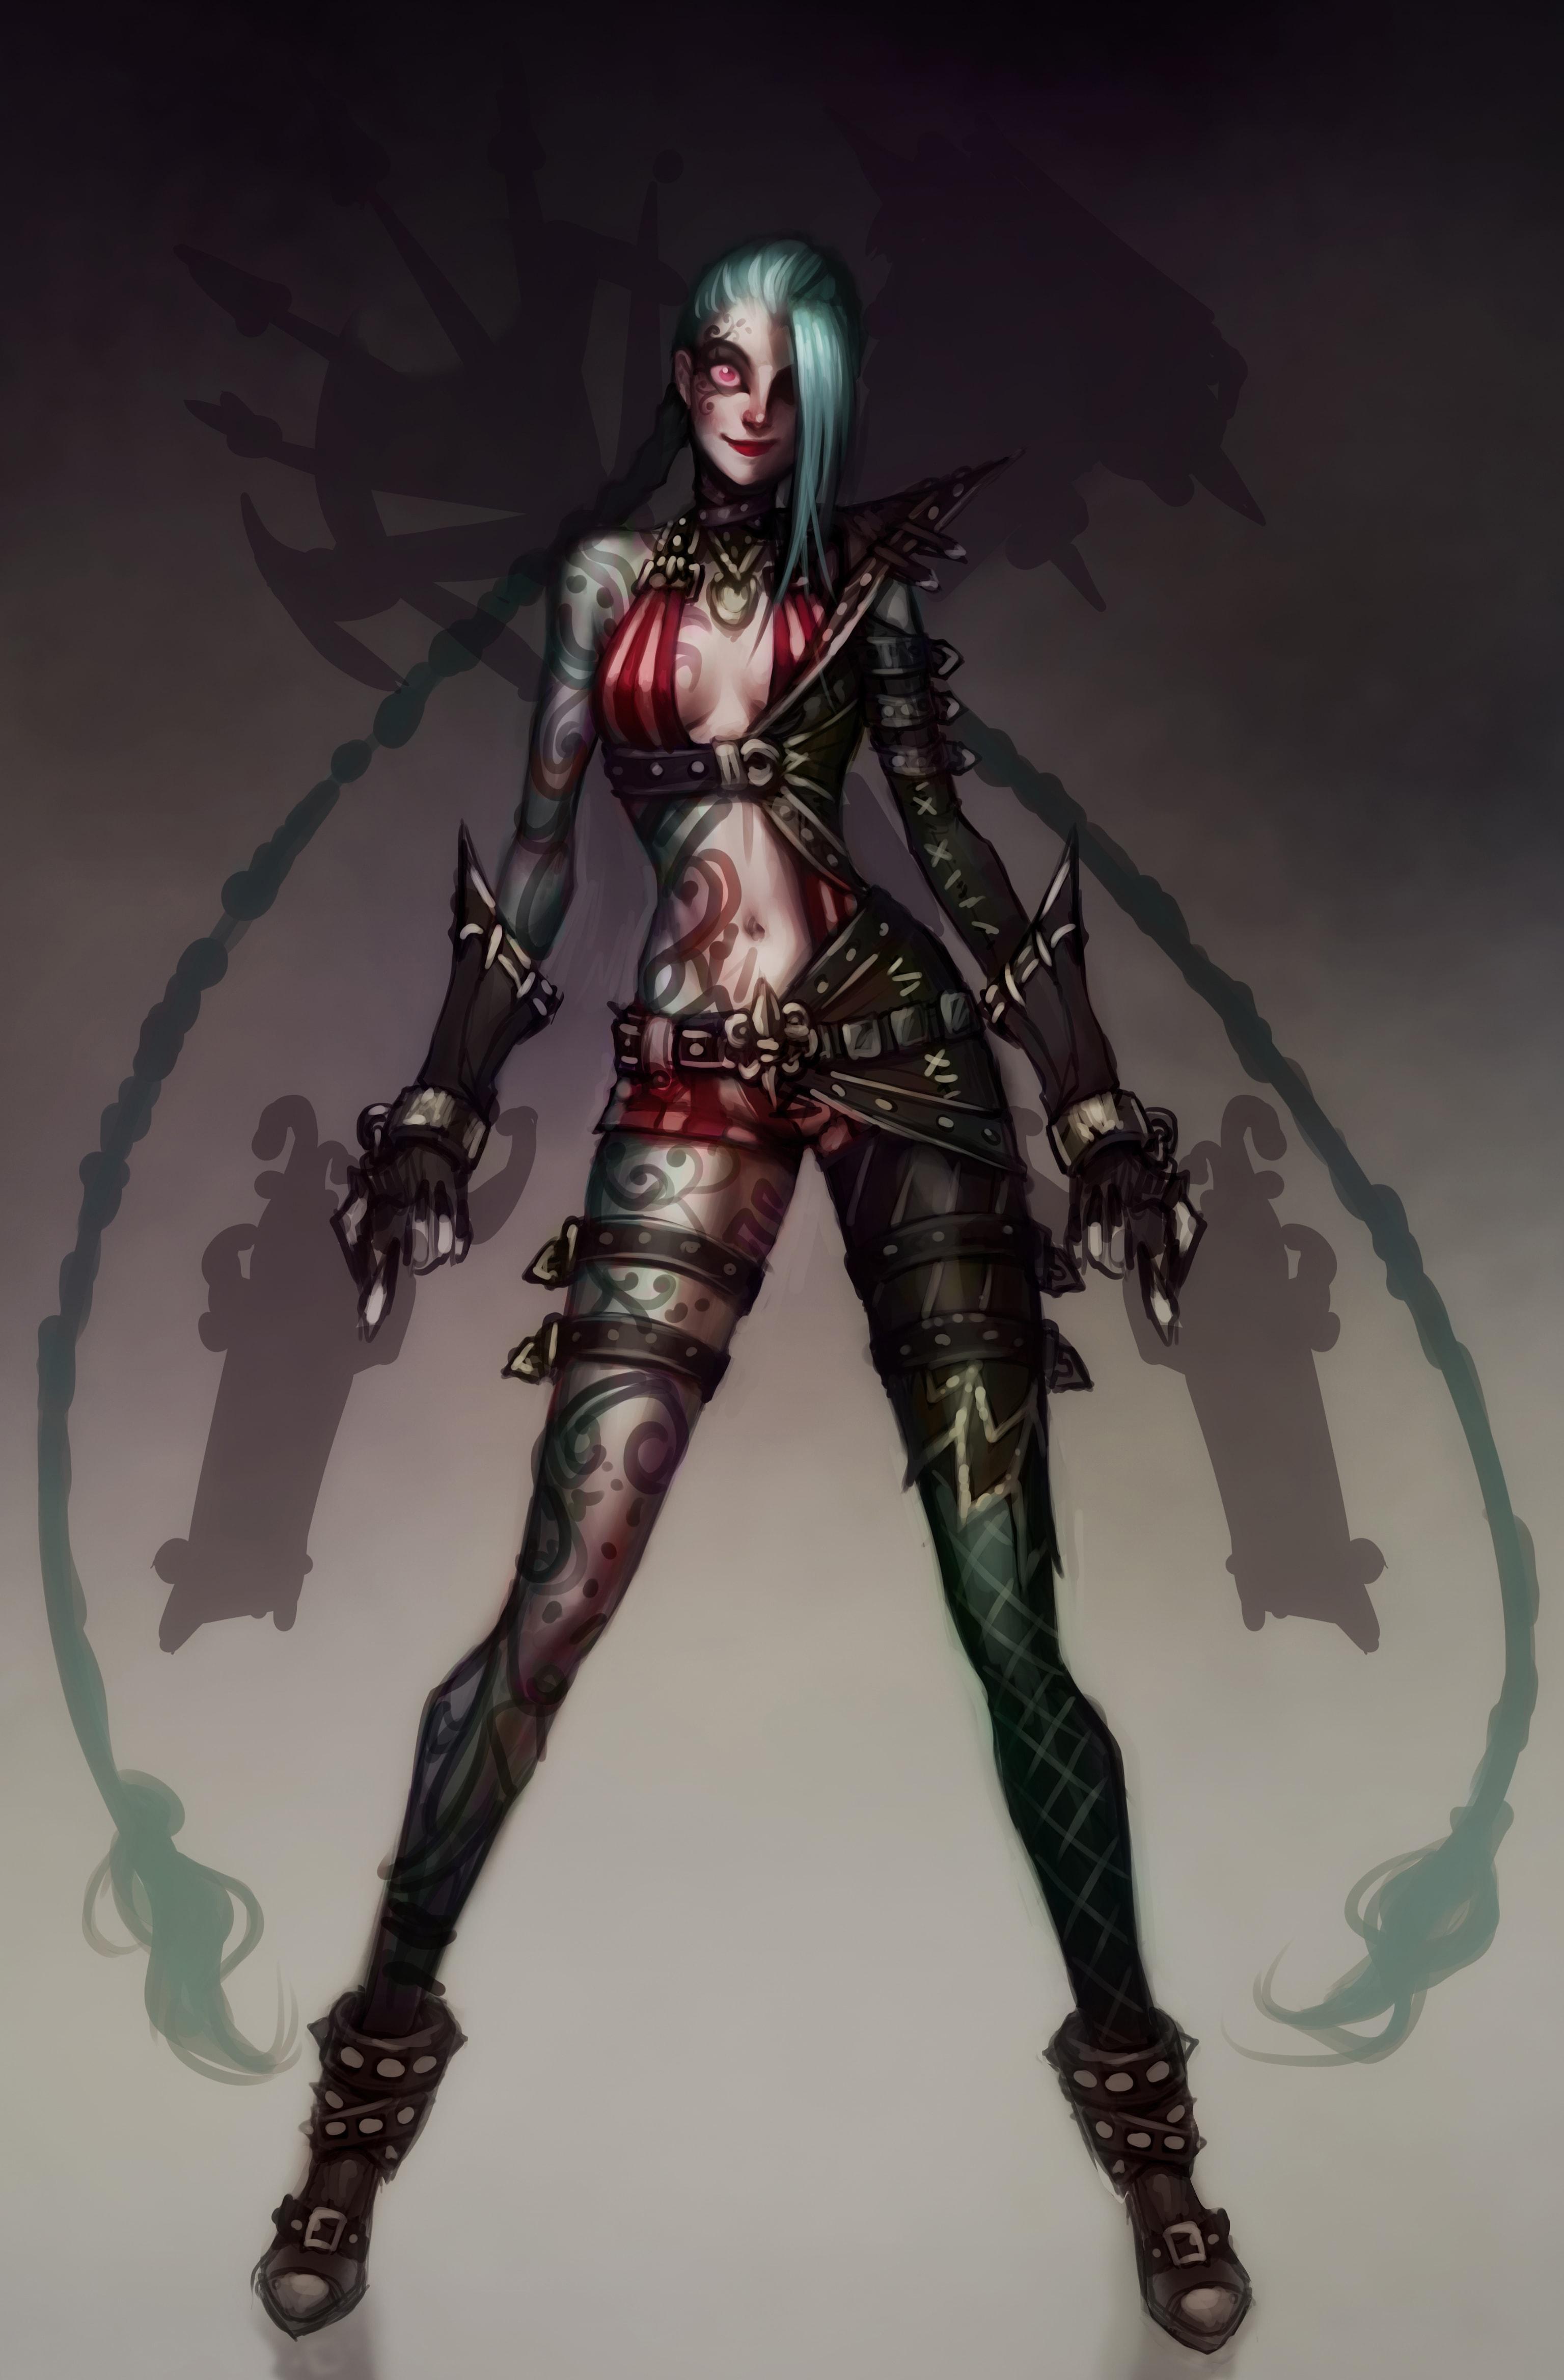 Concept Art for Psycho Arsenal (Jinx)